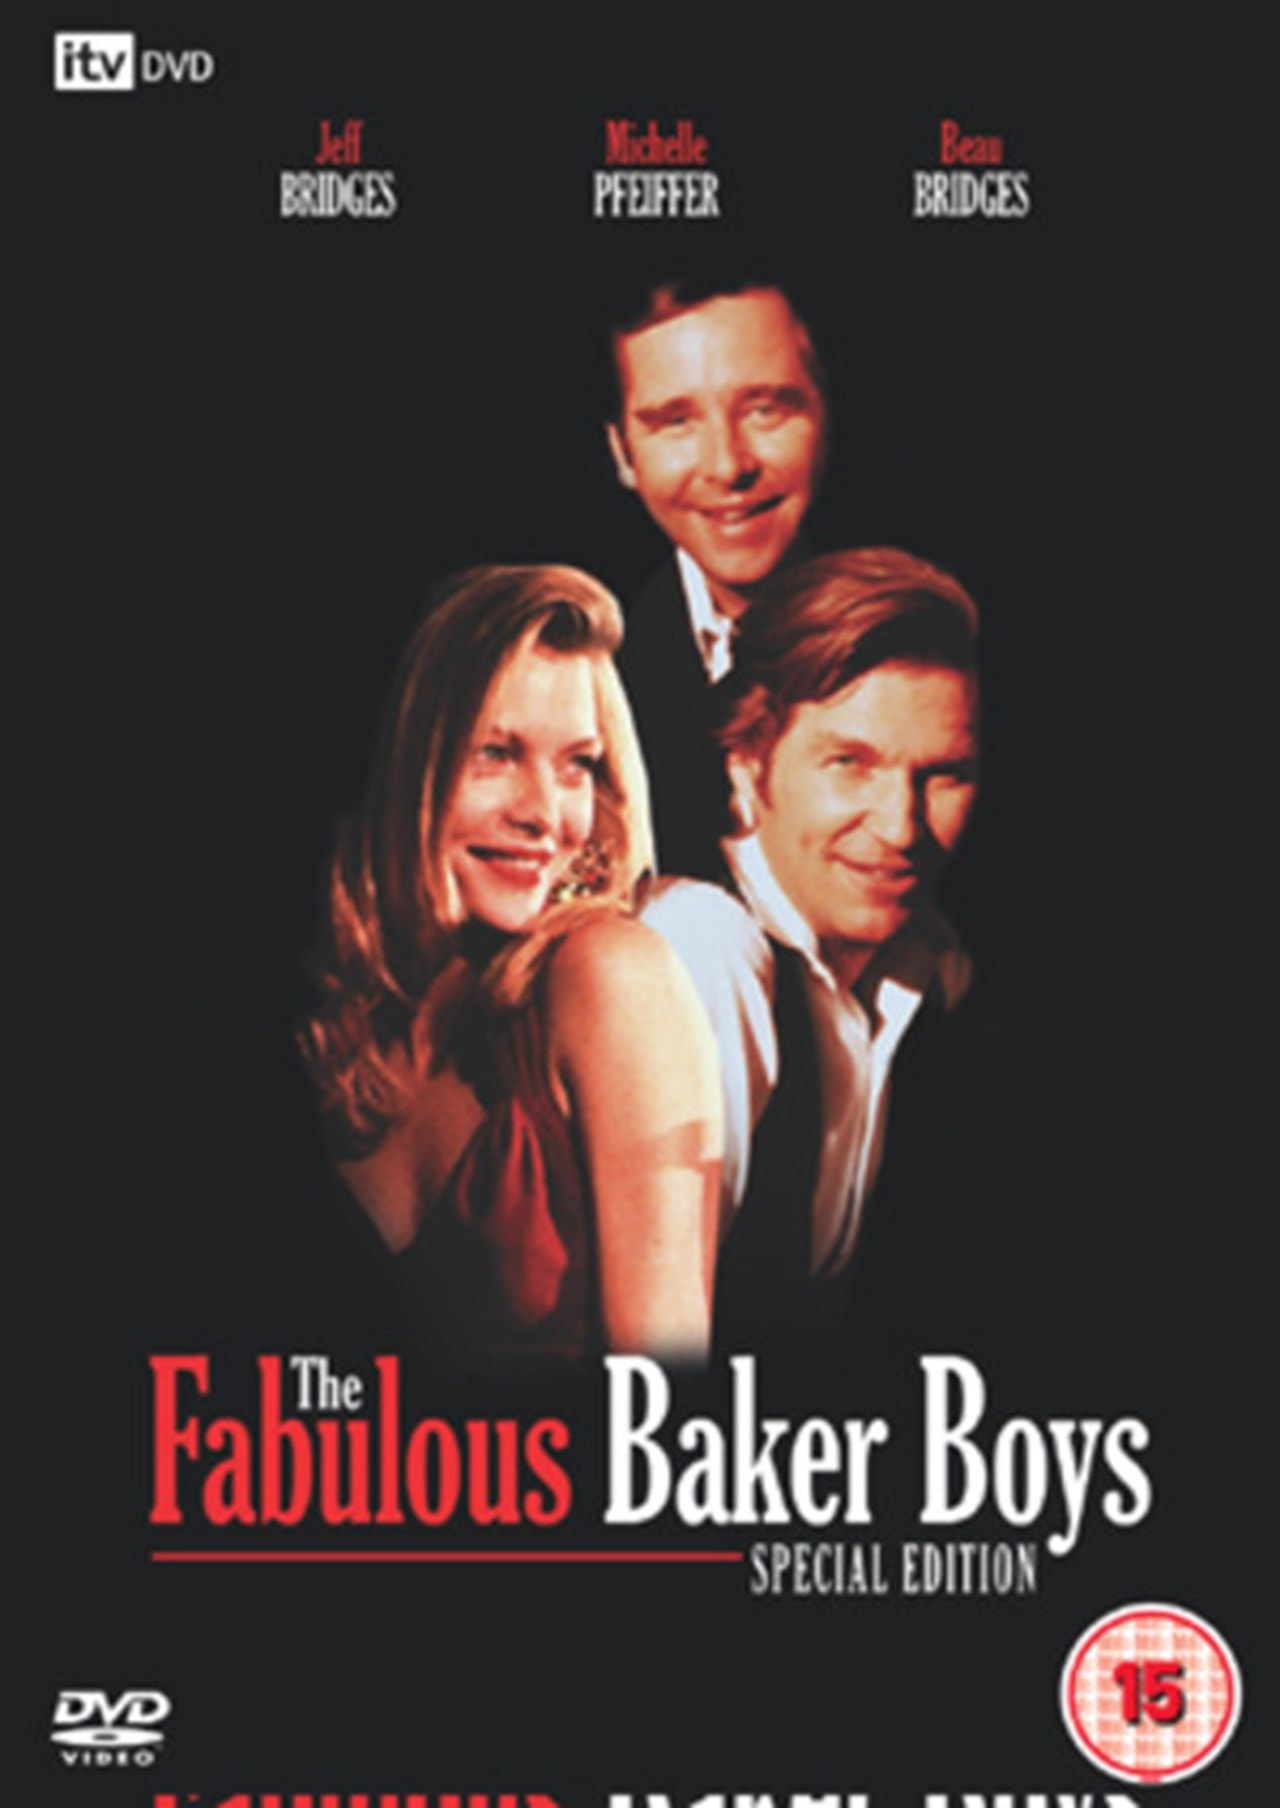 The Fabulous Baker Boys - 1